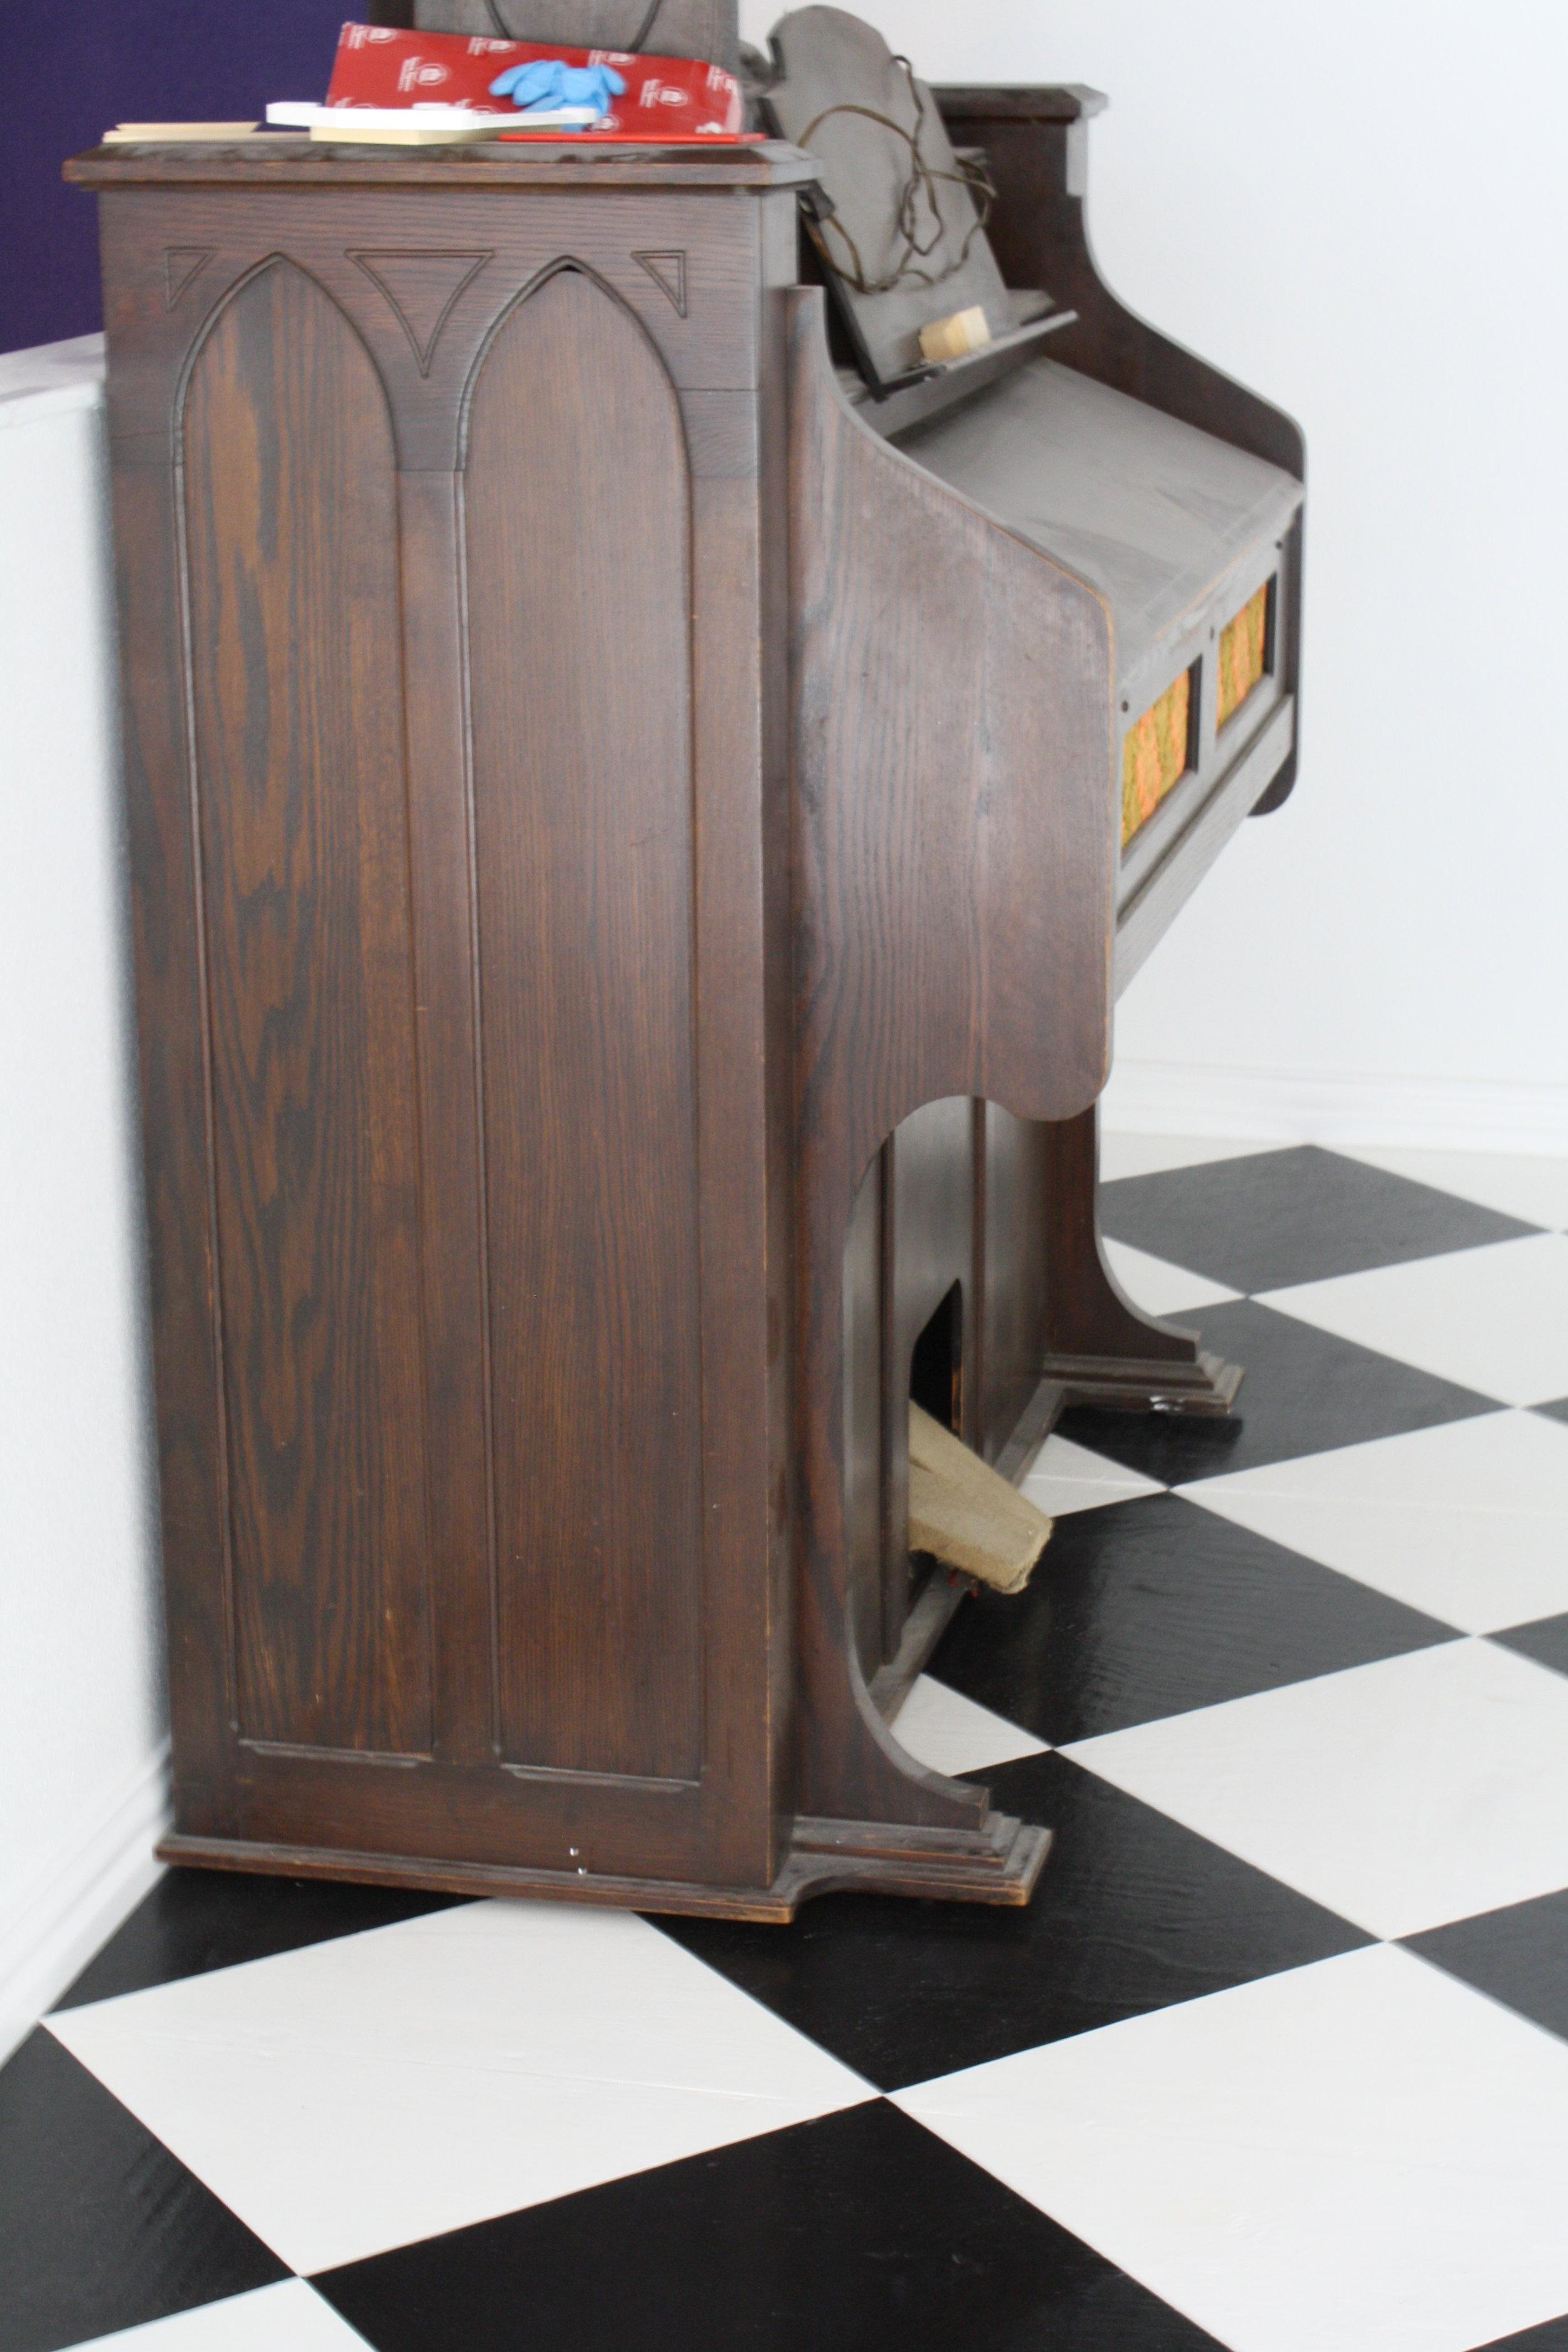 My grandfather's Gothic organ